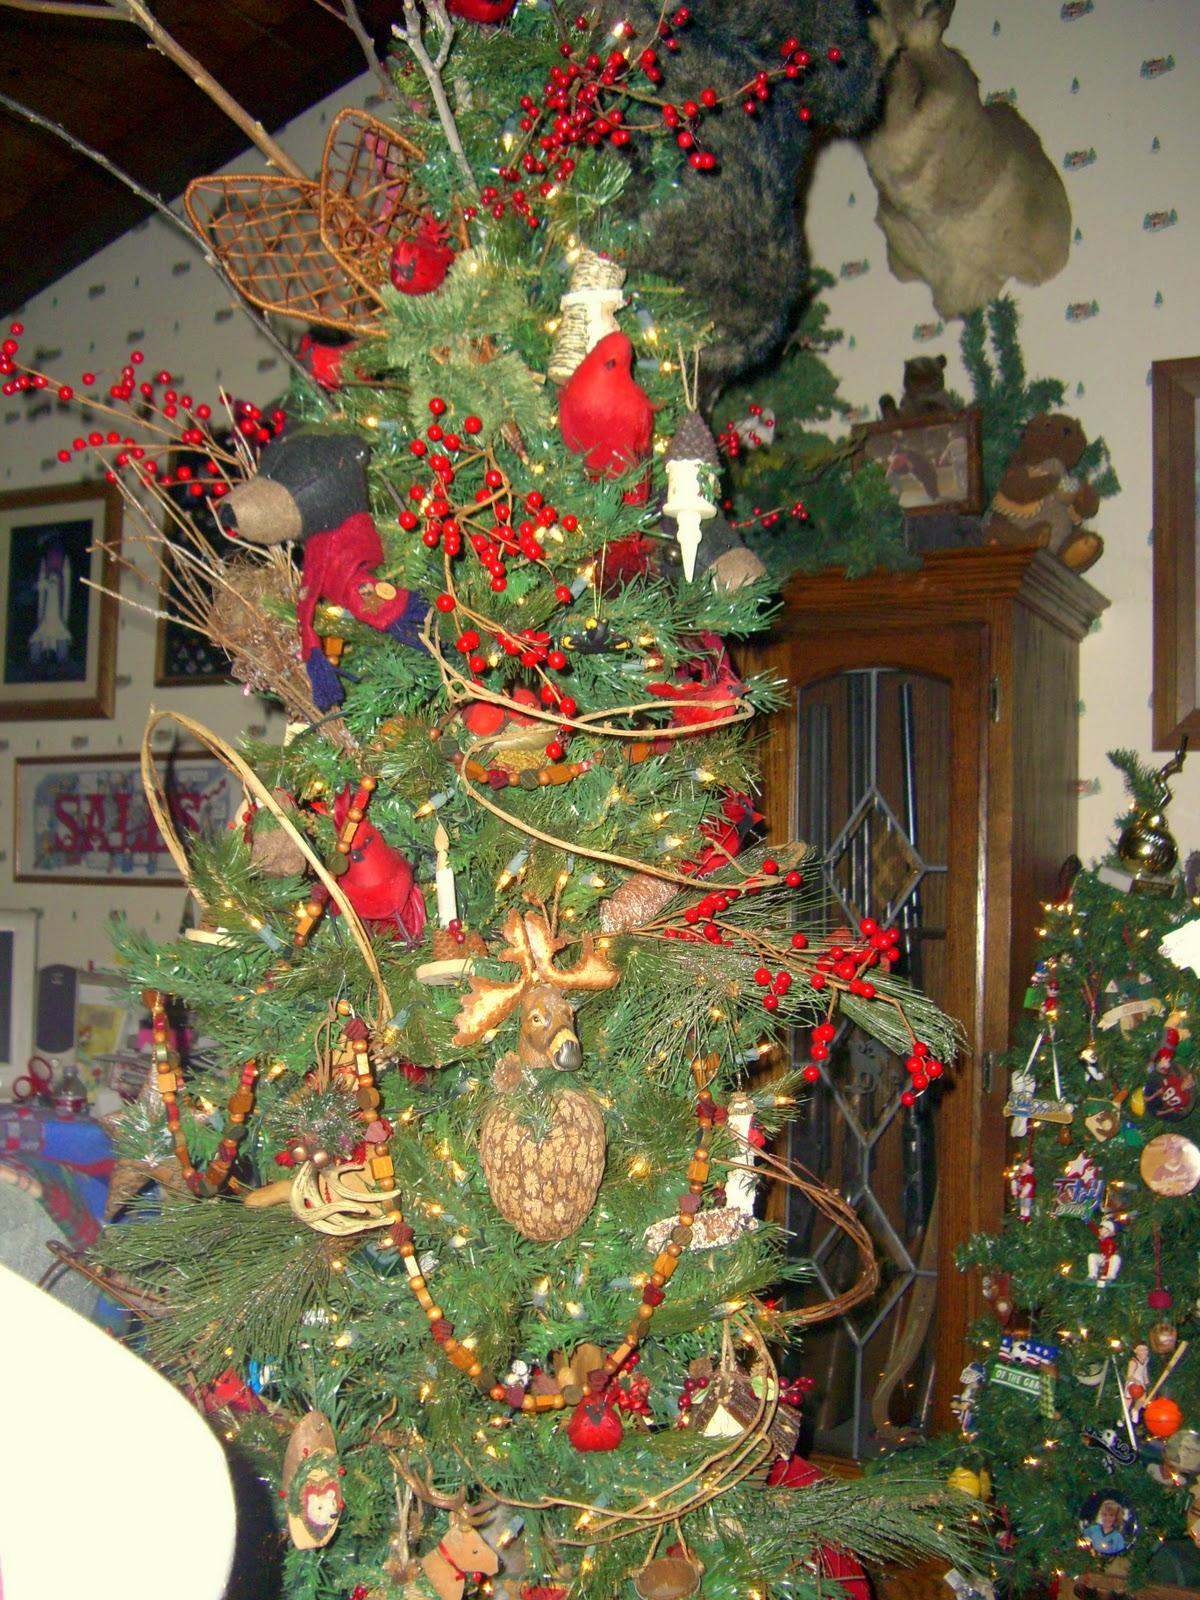 Yeowzers: House full of Christmas trees